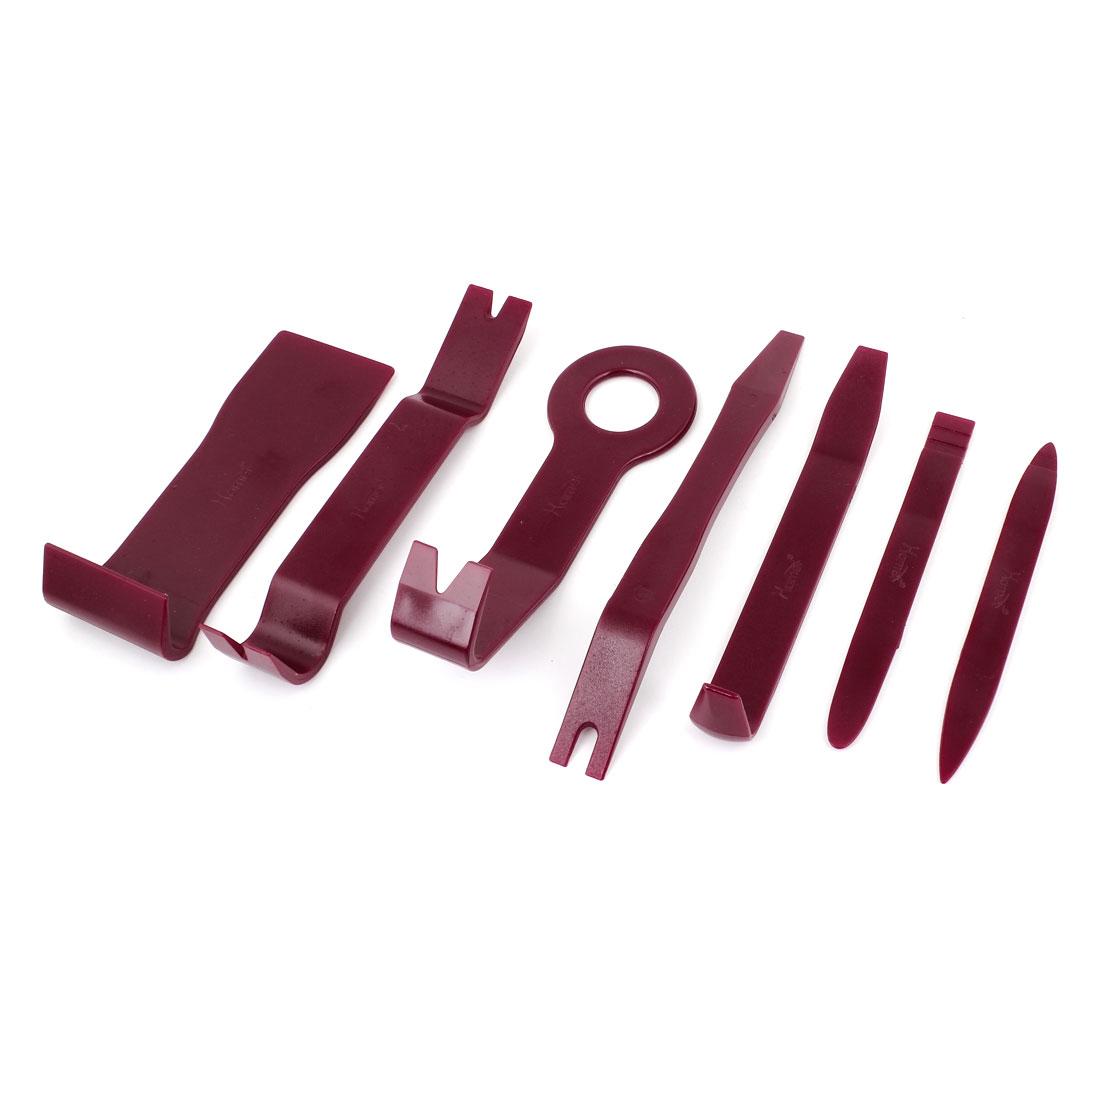 7 Pcs Red Audio Loudspeaker Repair Removal Dismantle Tools for Auto Car